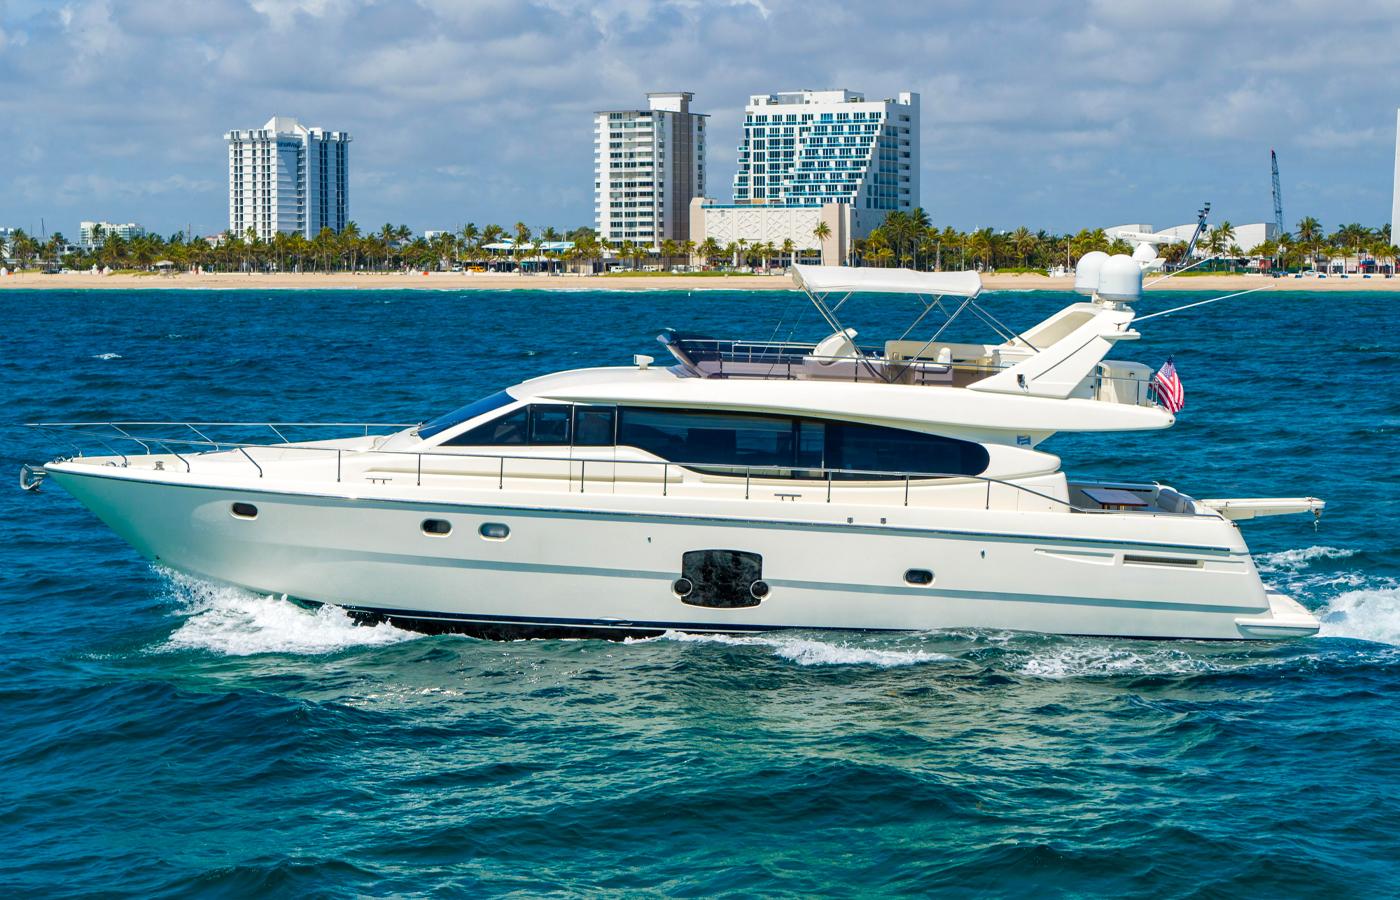 Ferretti 63 Motor Yacht Highlight [Boat Review + Video]